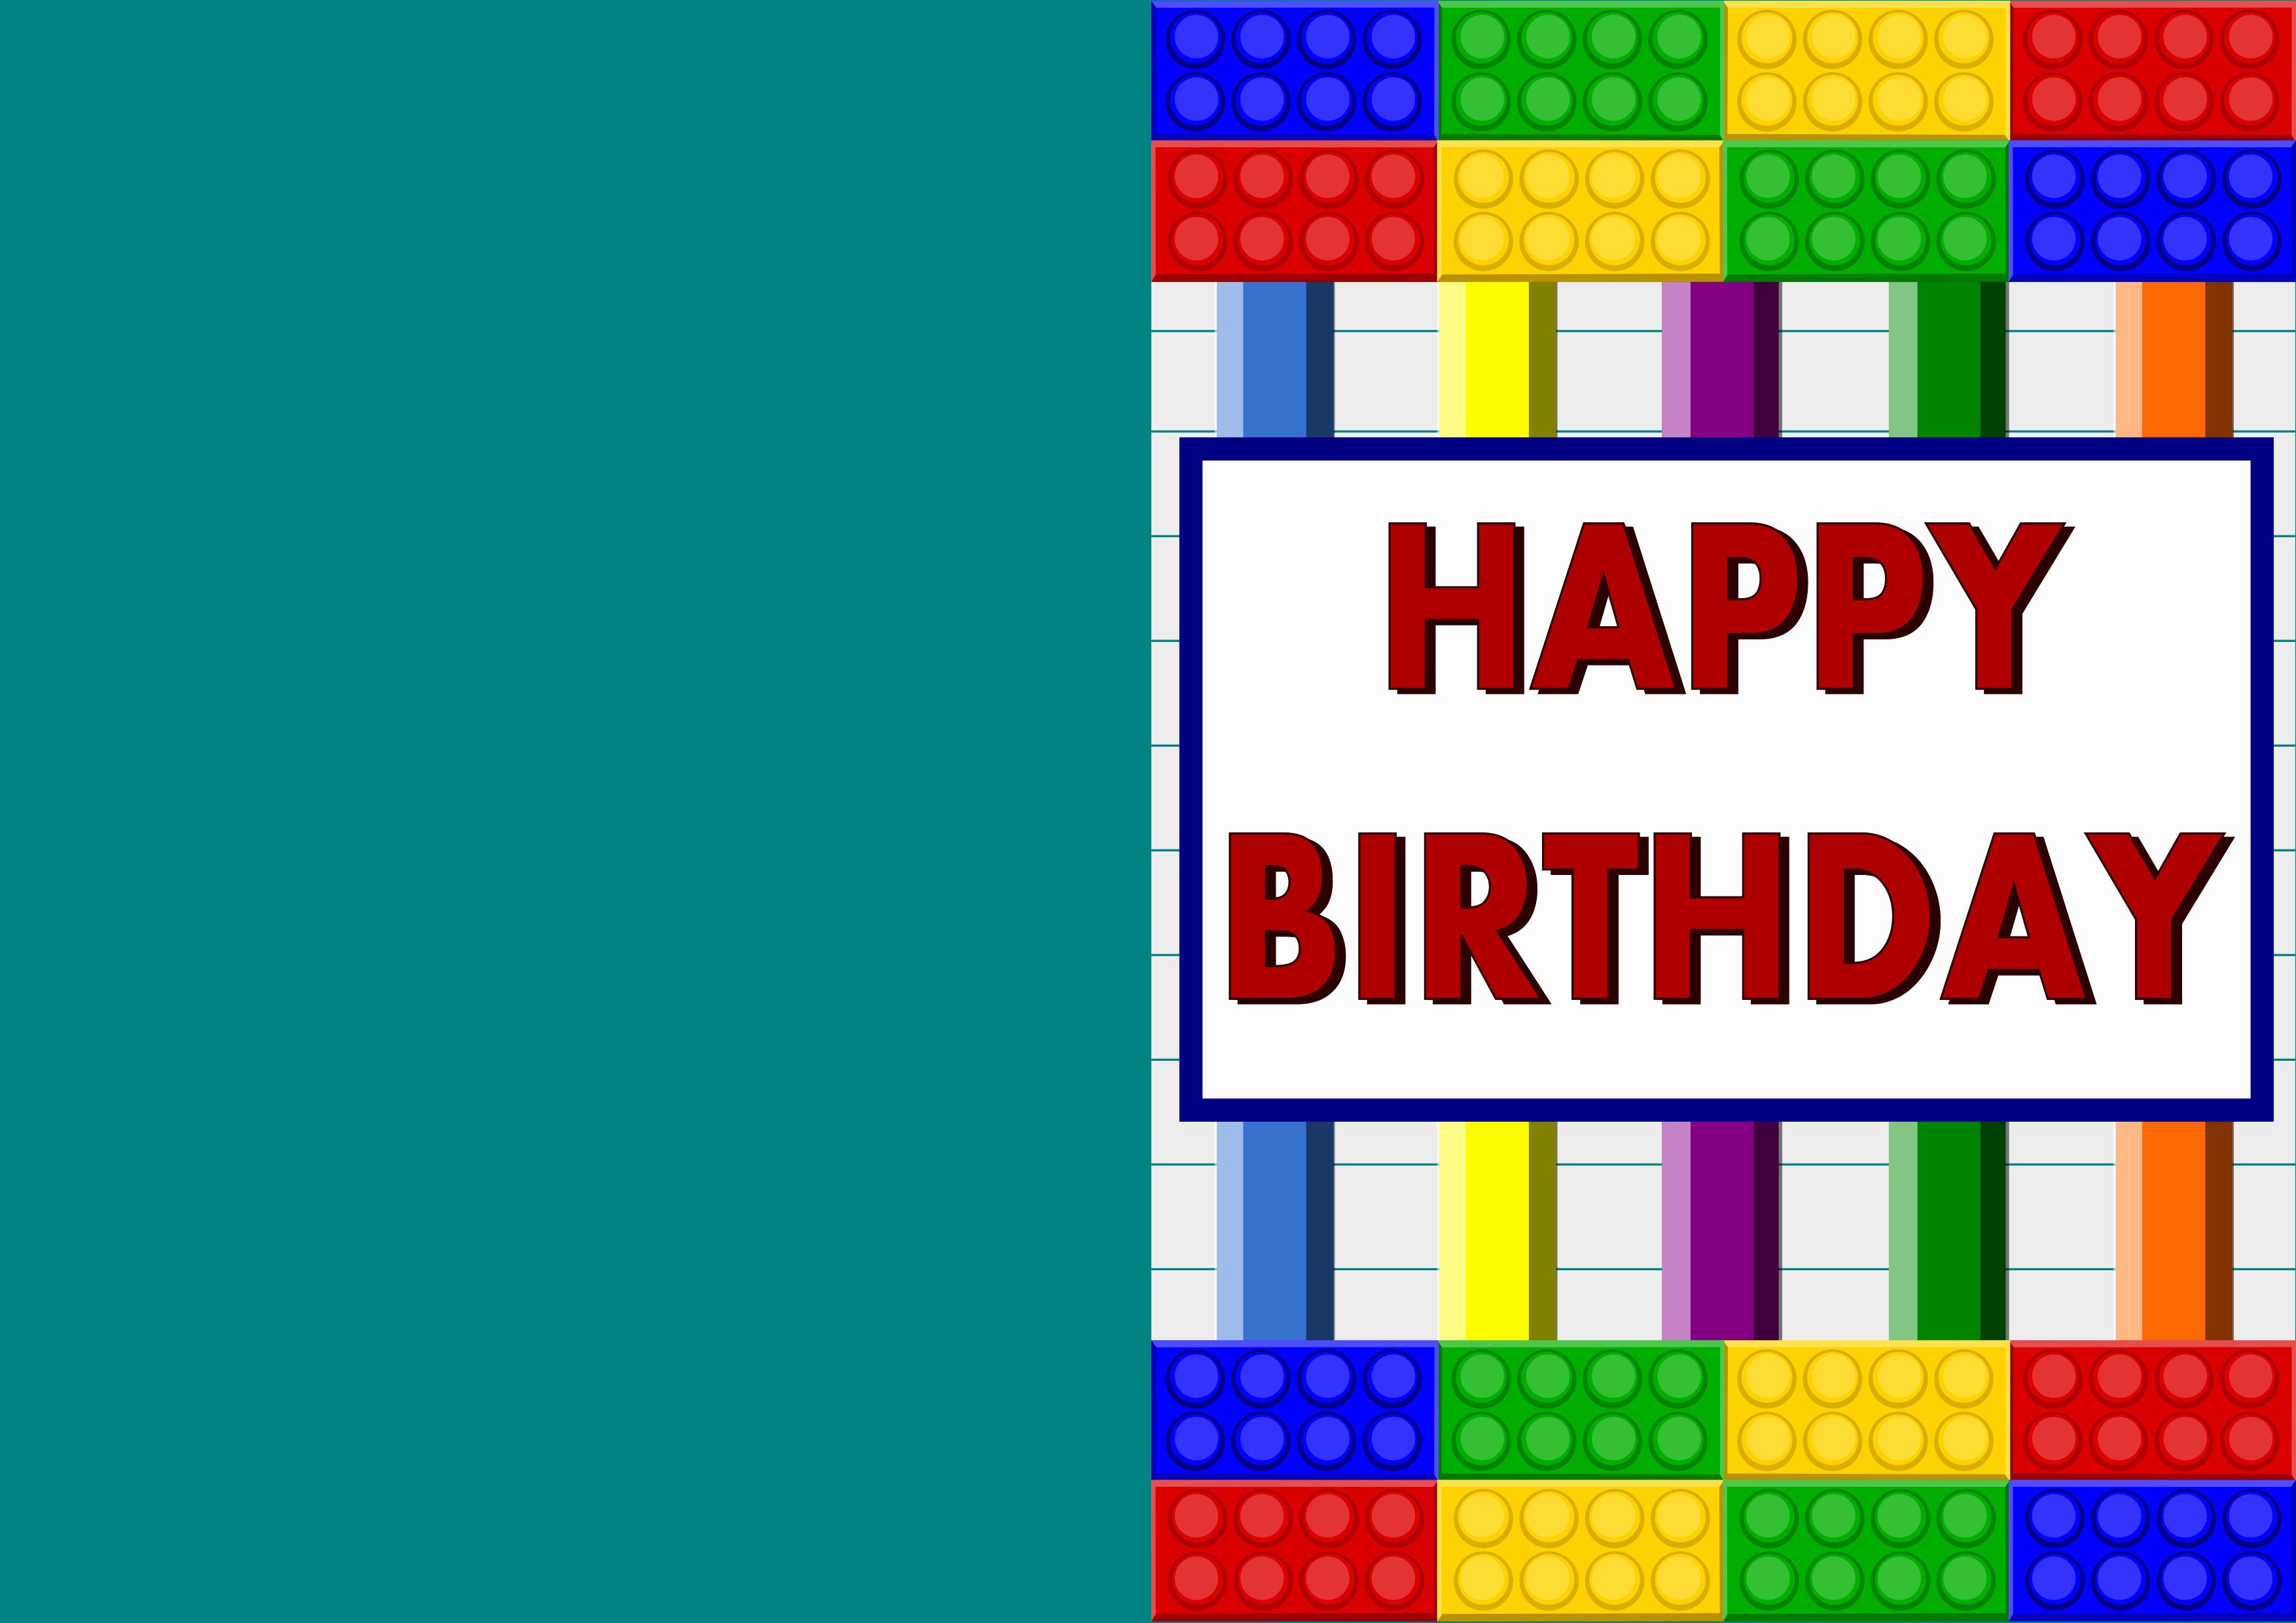 Lego Birthday Card Printable Unique Printable Cards – Stormdesignz